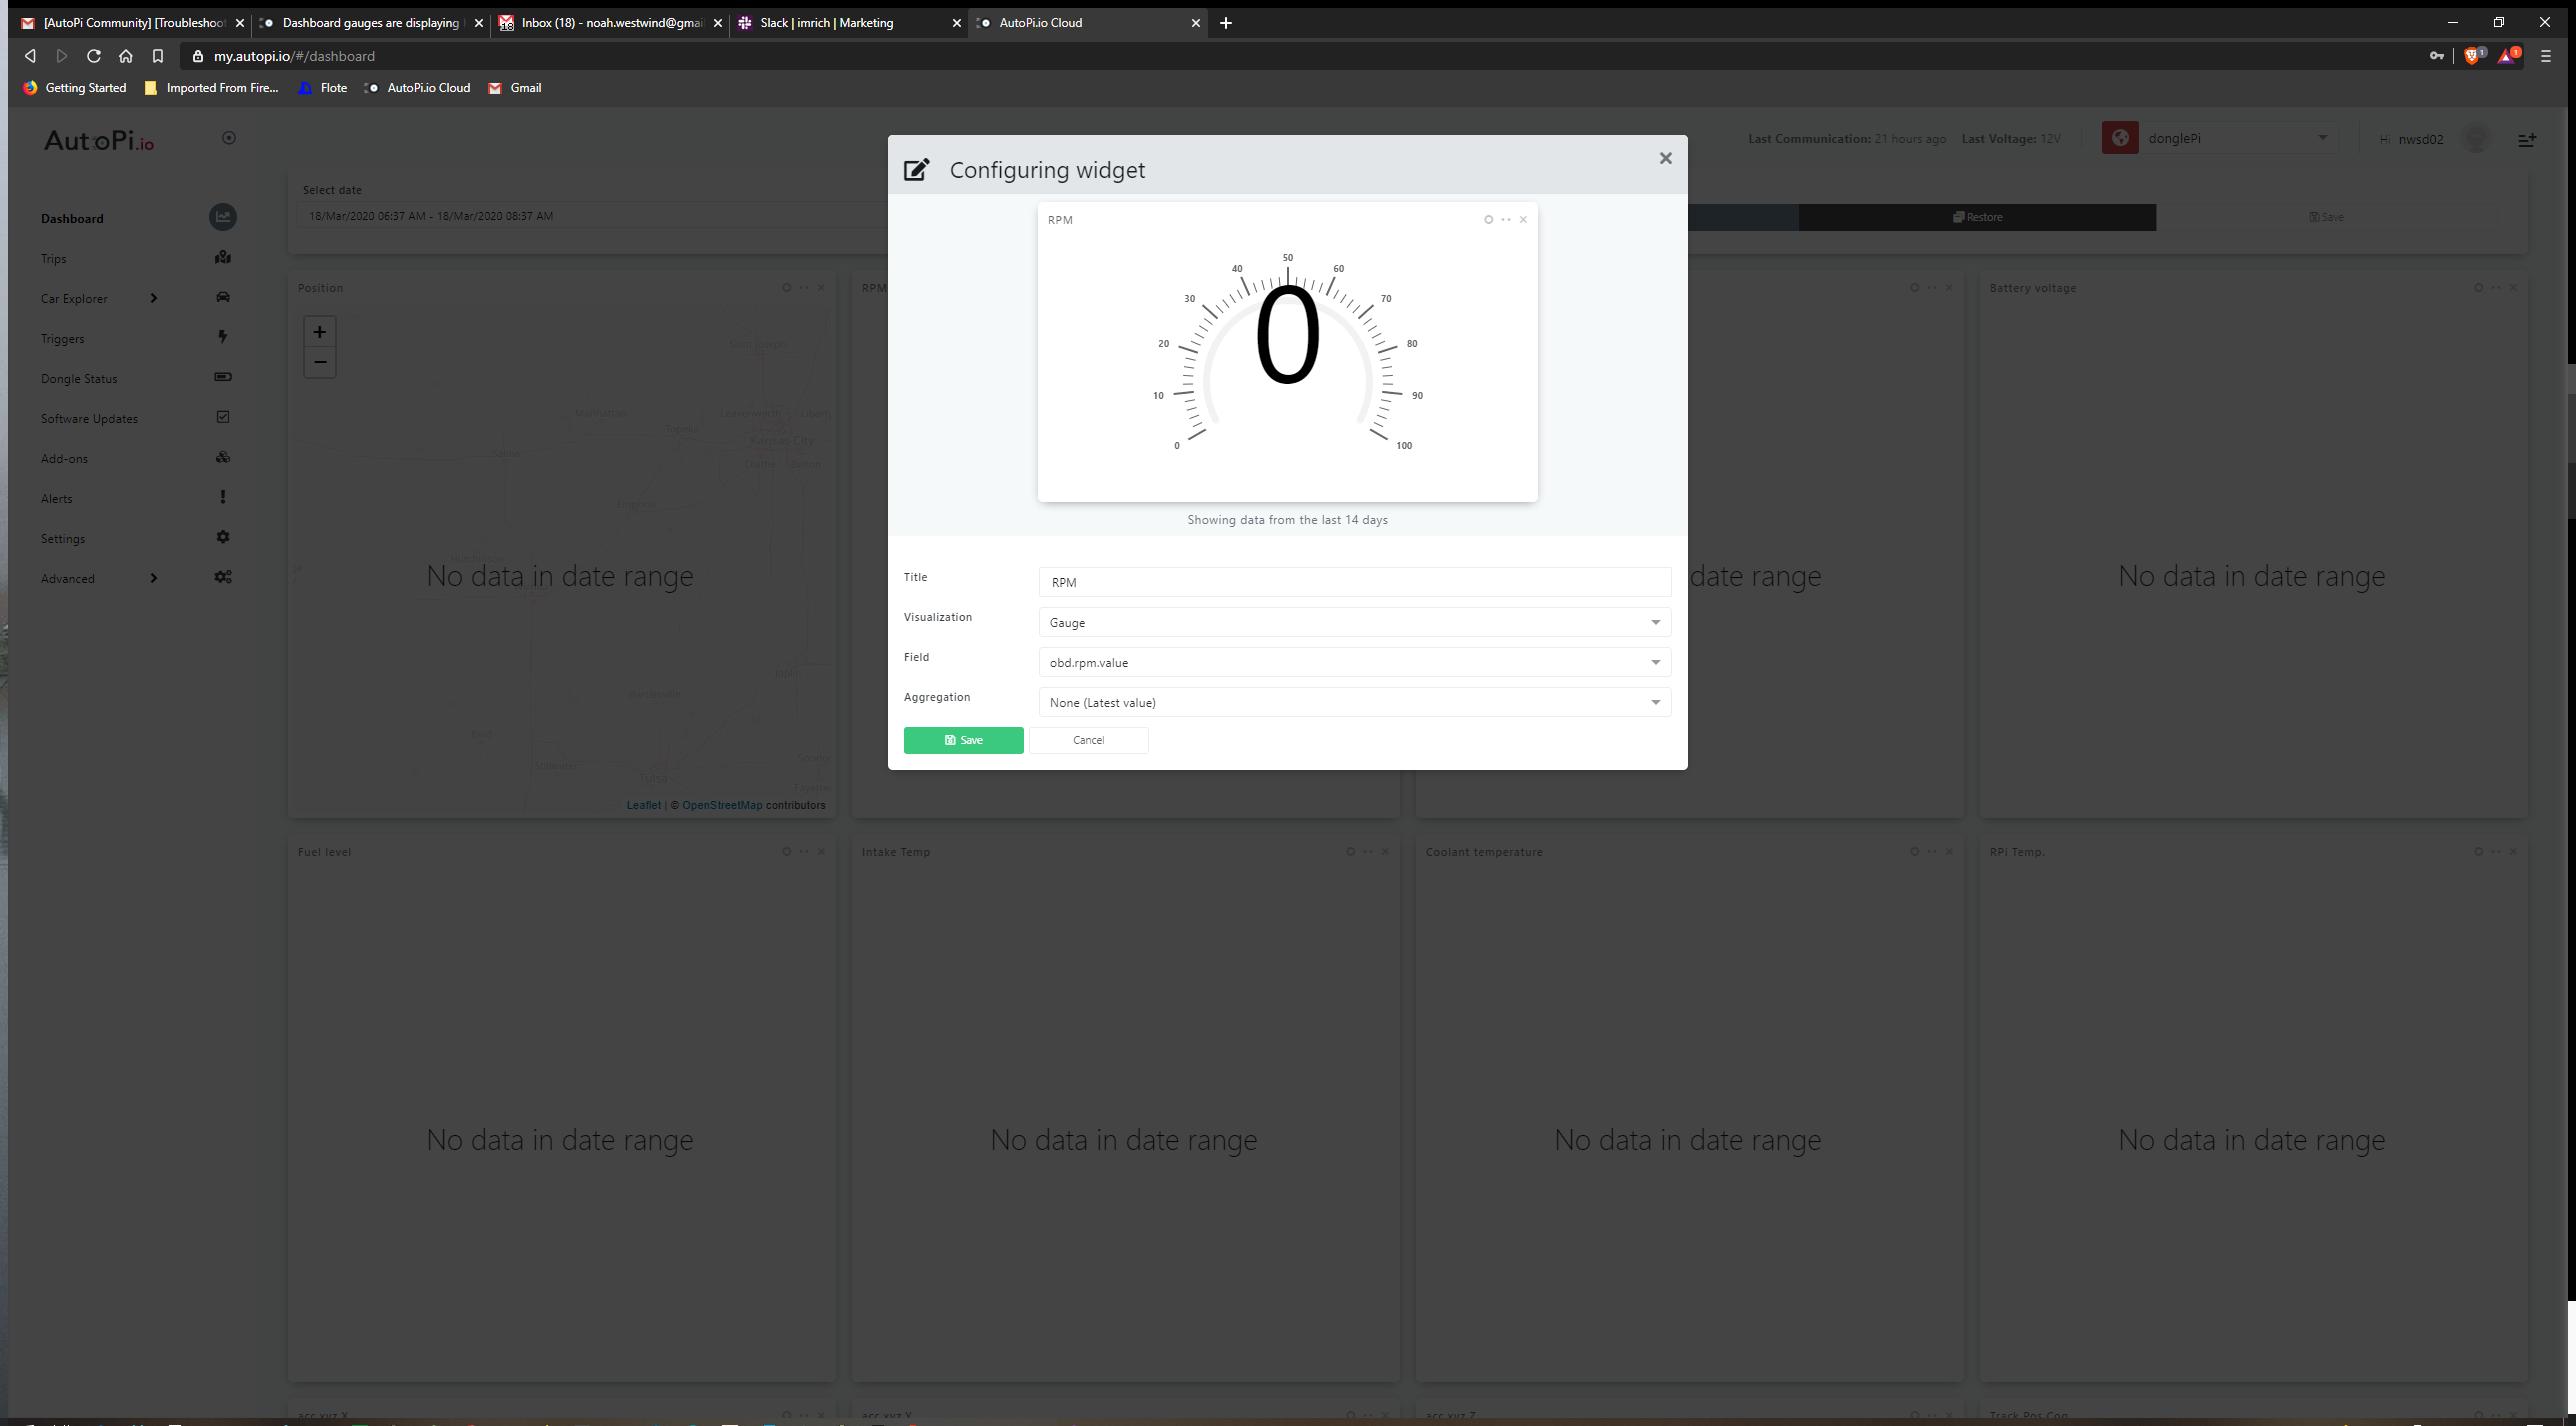 Screenshot 2020-03-18 08.38.57